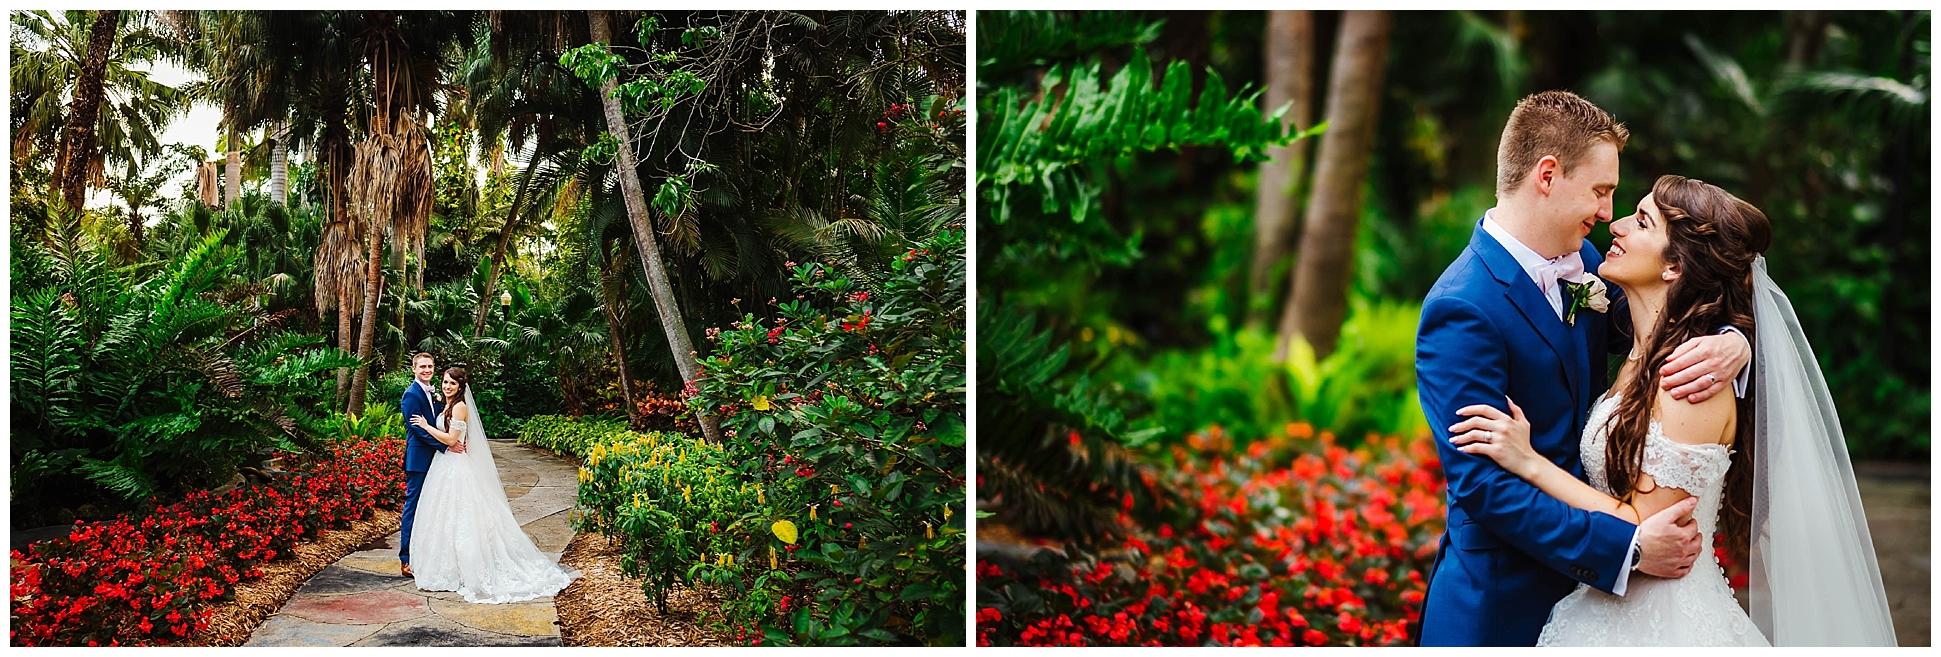 st-pete-wedding-photographer-sunken-gardens-crystal-ballroom-princess-dancer_0170.jpg